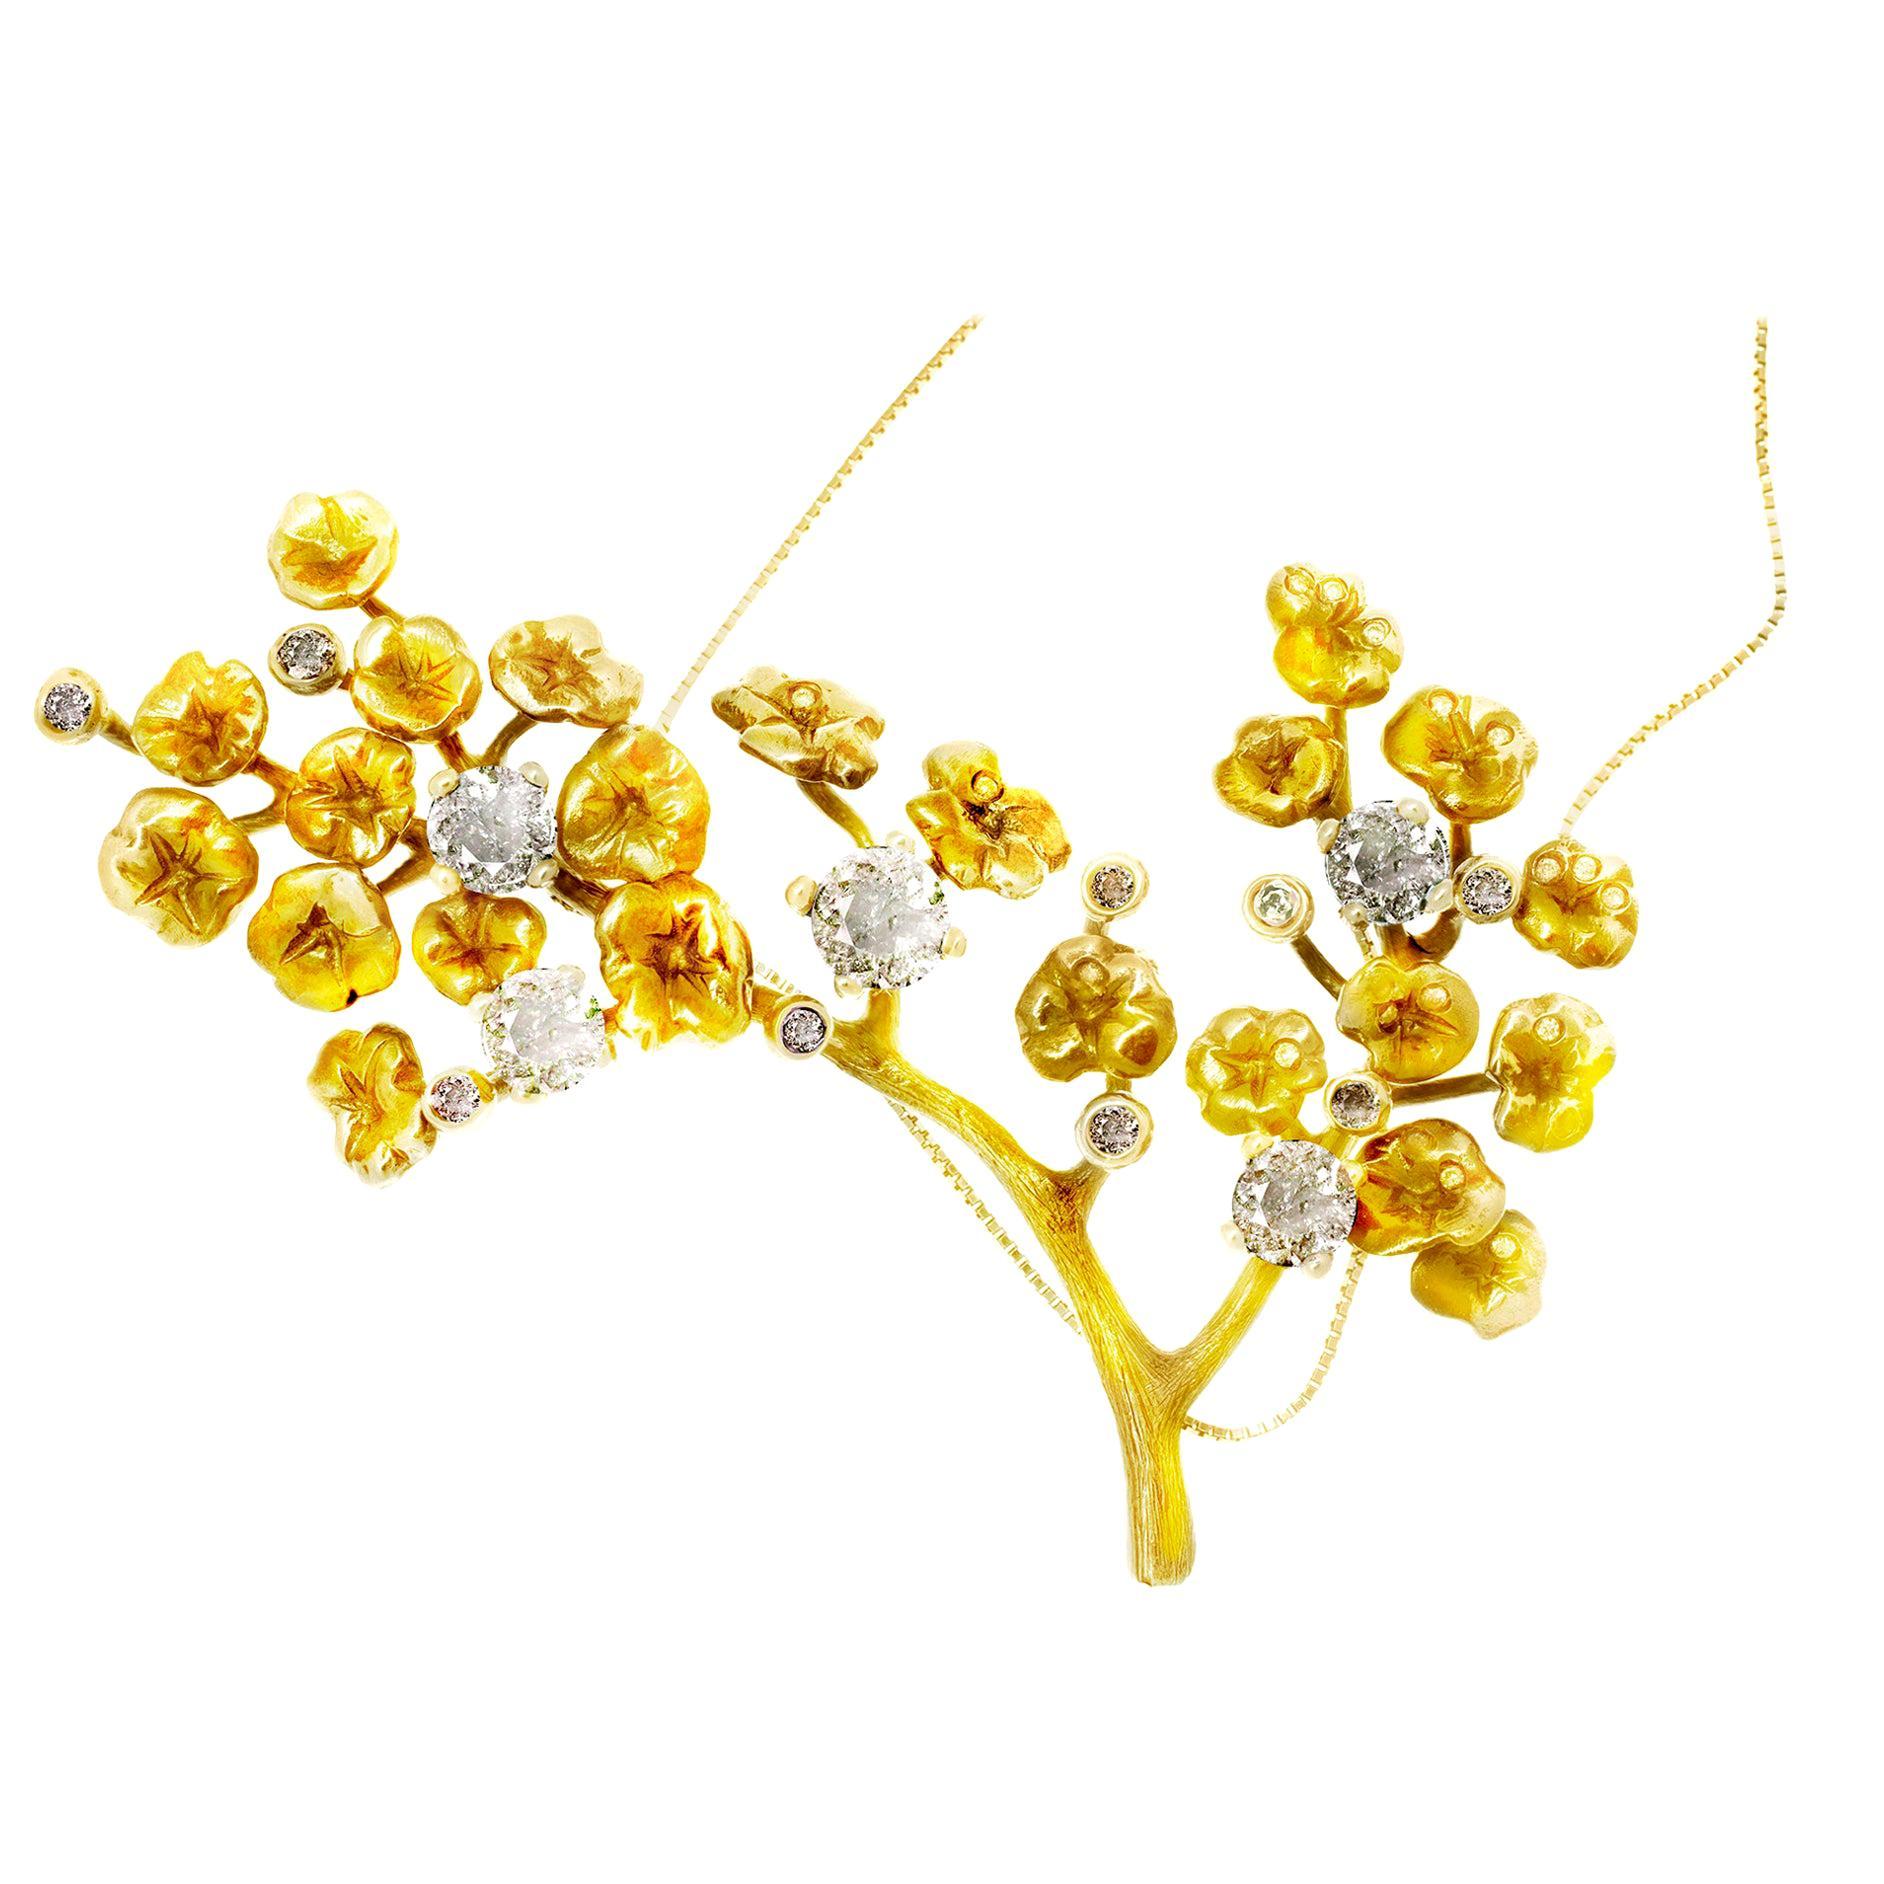 GIA Certified 5.01 Carat Diamonds, 18 Karat Gold Pendant Necklace